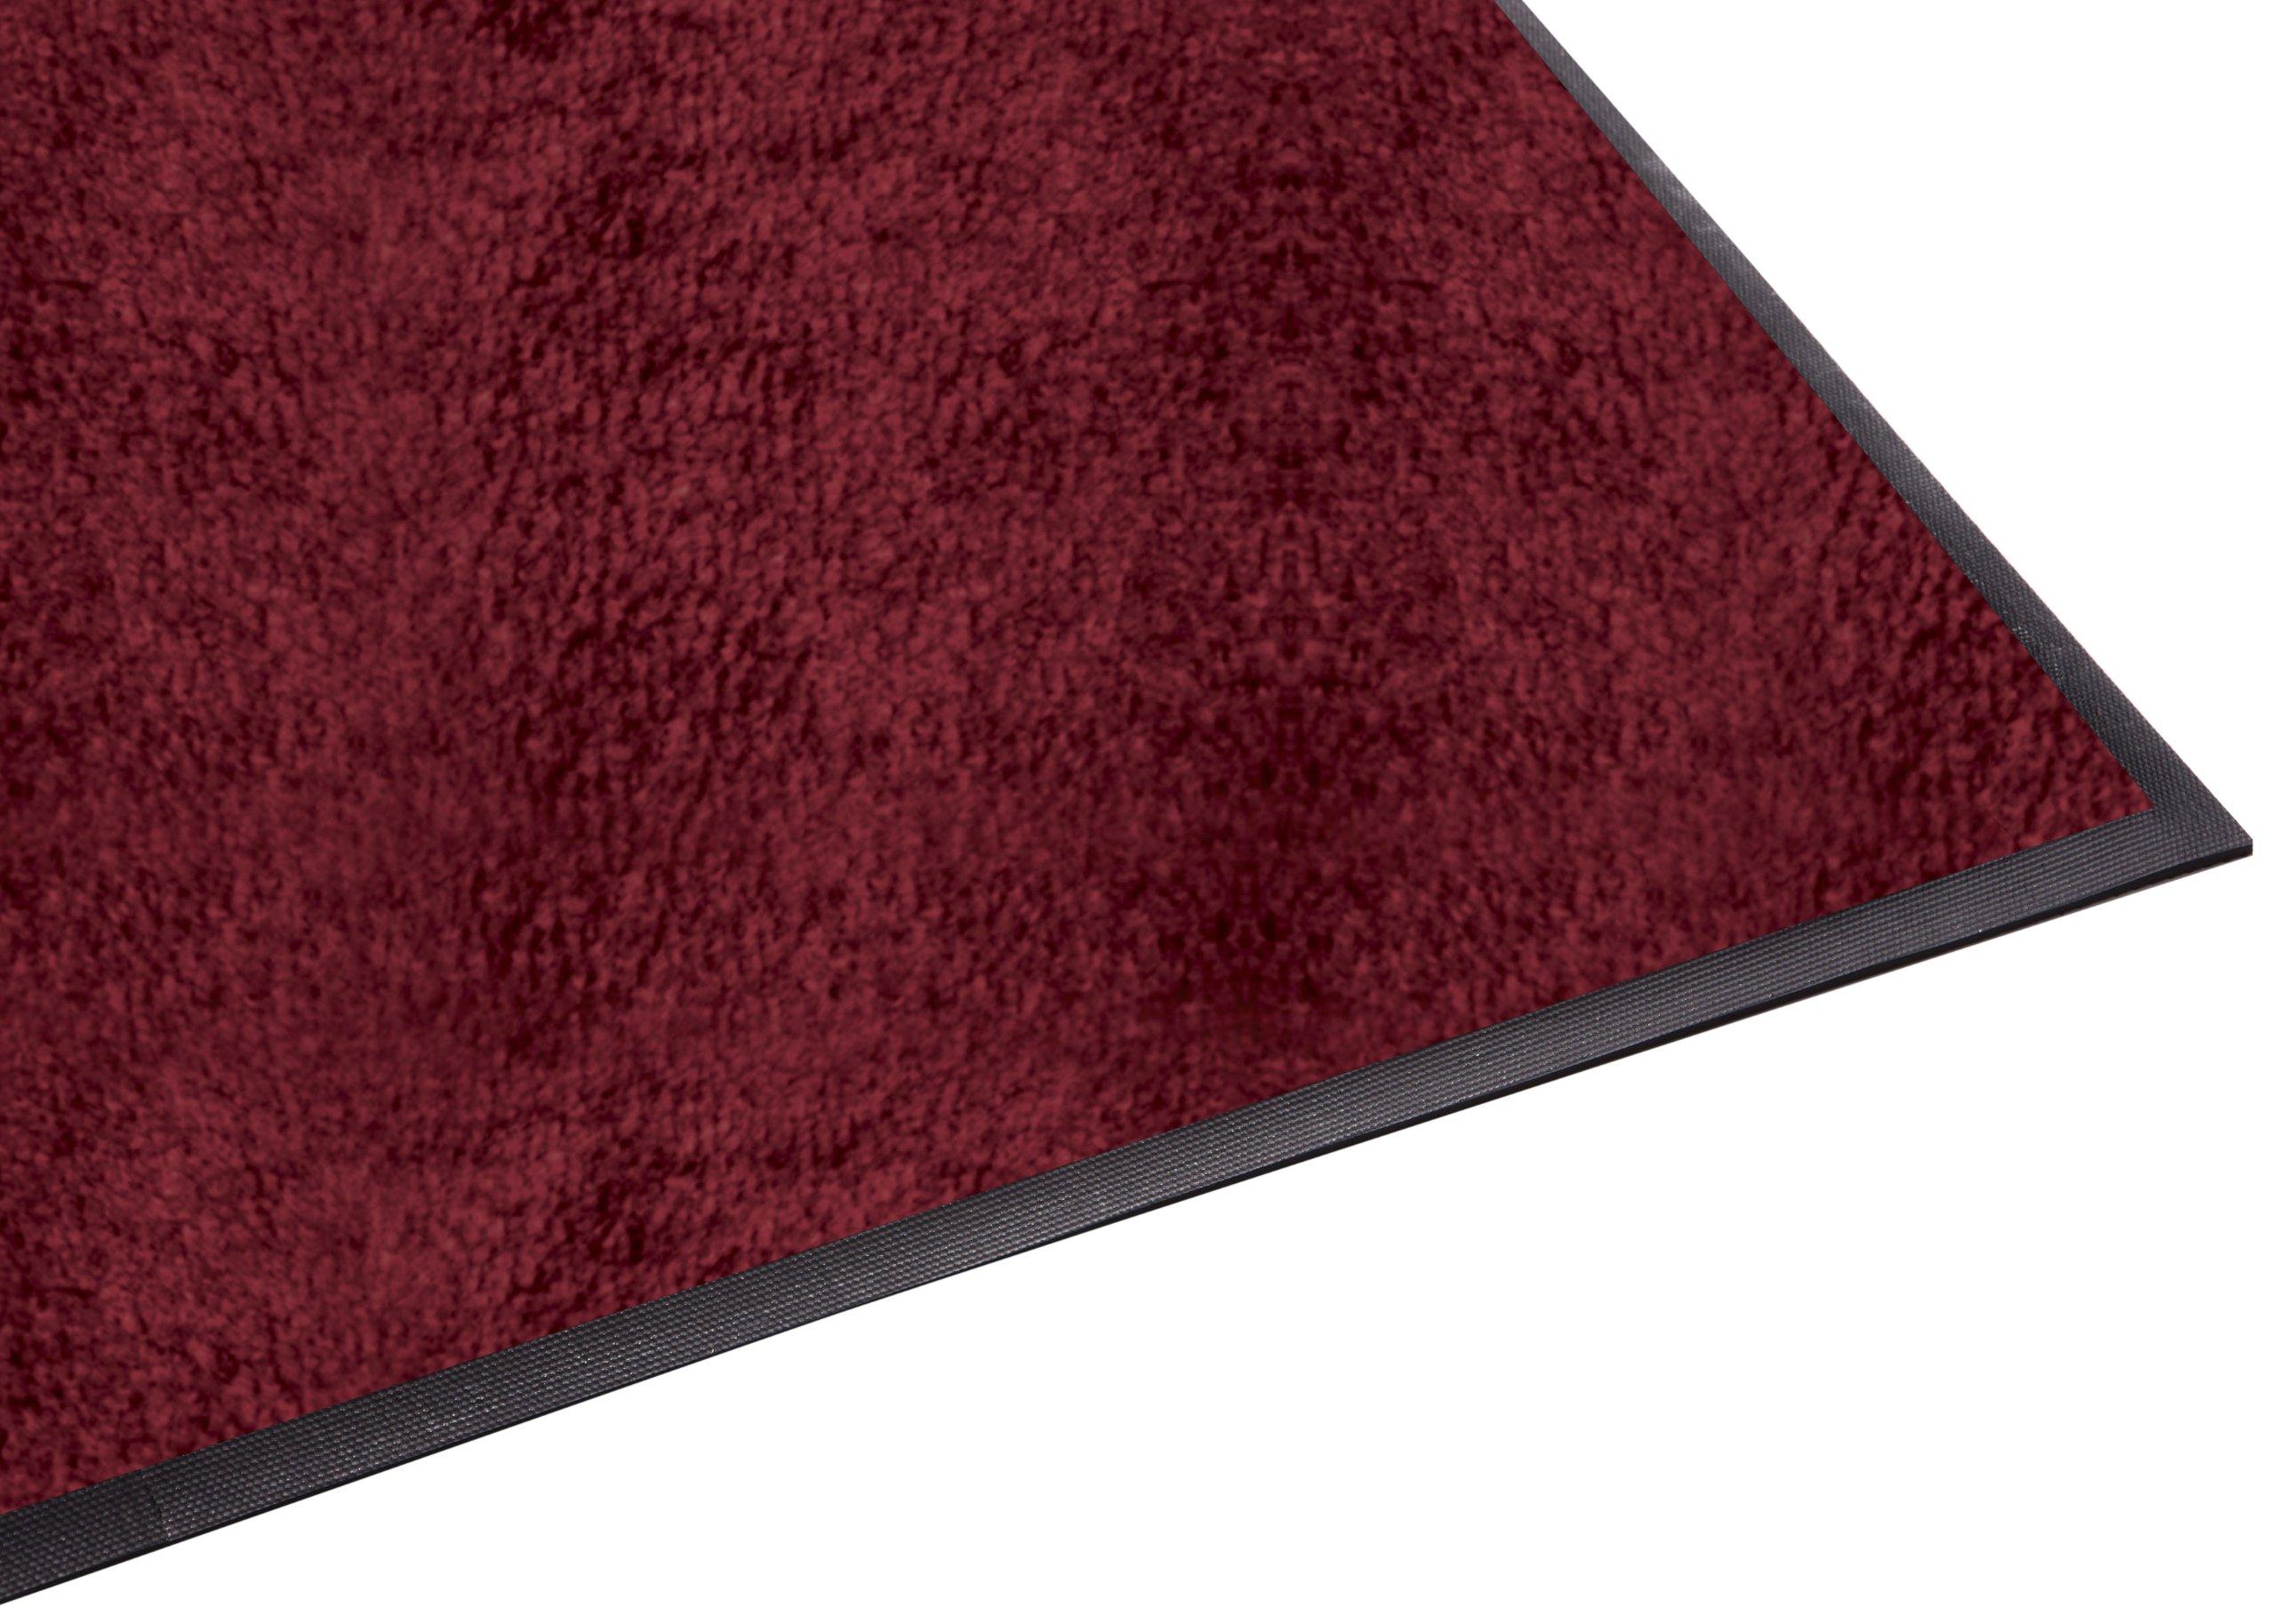 Guardian Platinum Series Indoor Wiper Floor Mat, Rubber with Nylon Carpet, 6'x7', Burgundy